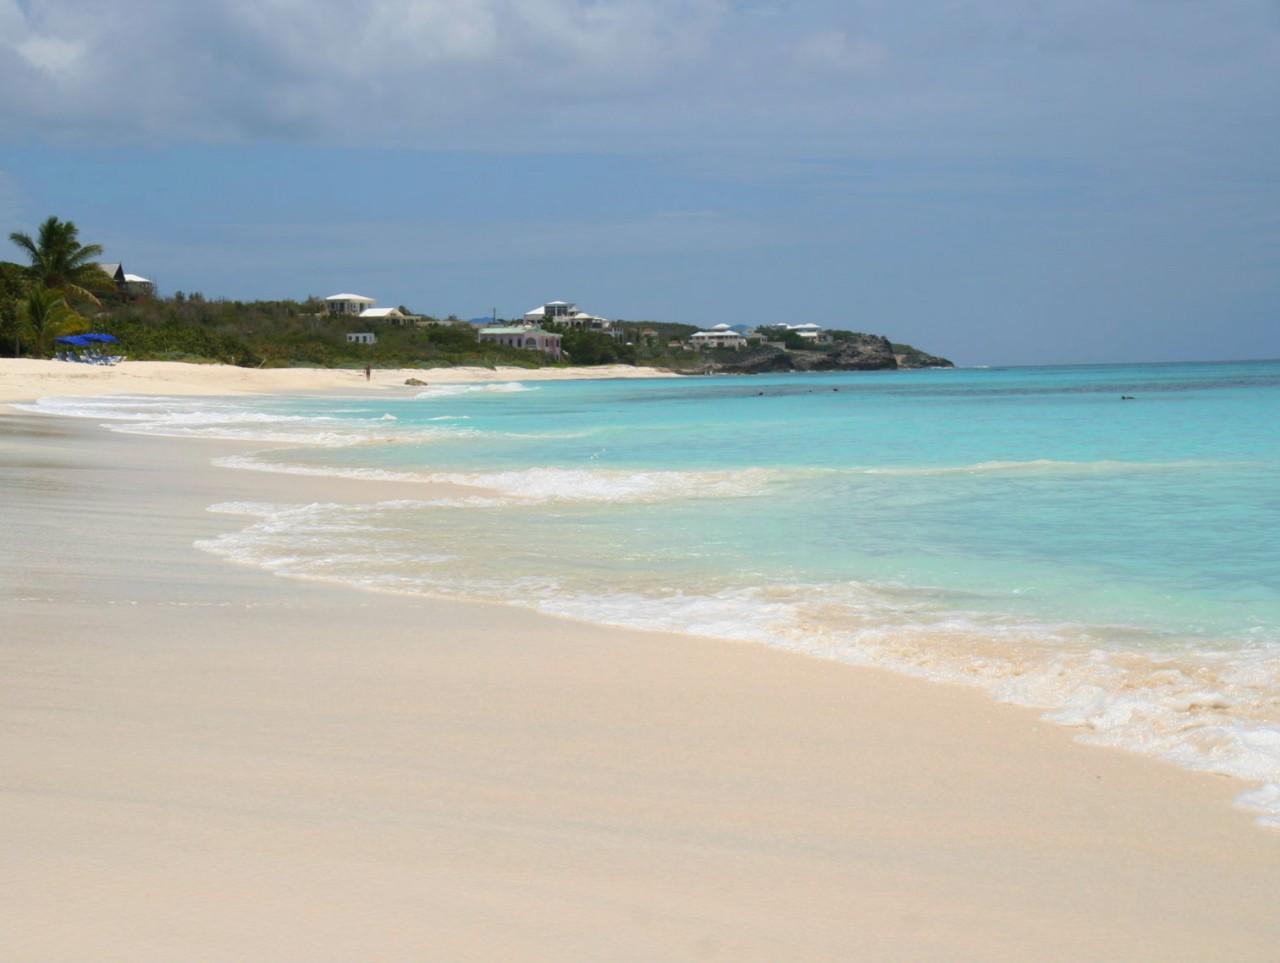 Anguilla: Trouver son coin de paradis, ausoleil